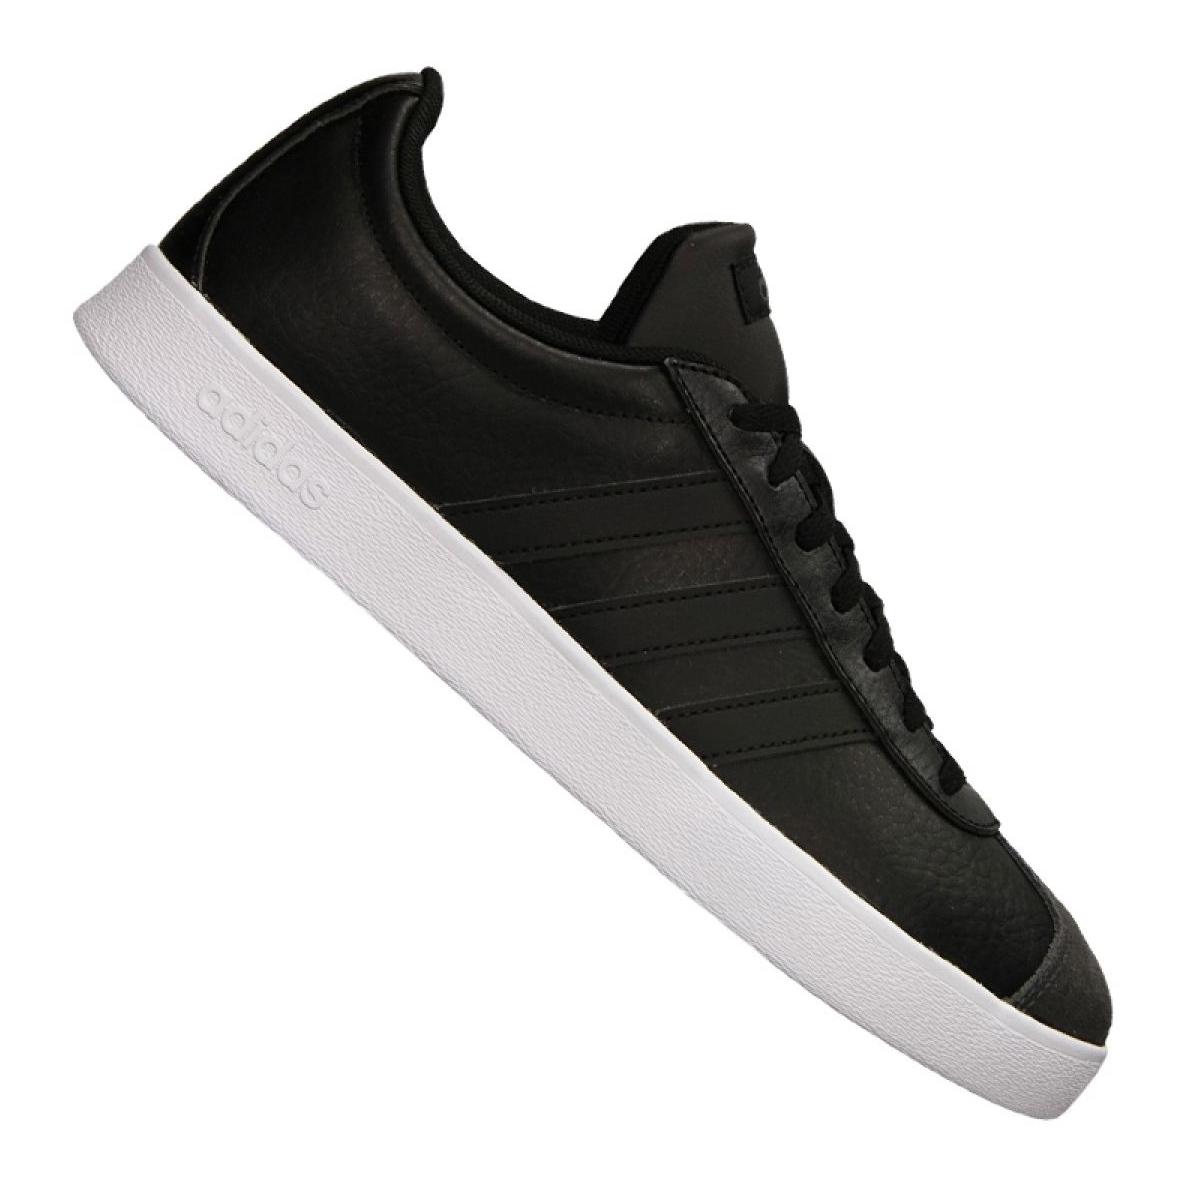 Adidas Vl Court 2.0 M DA9885 shoes